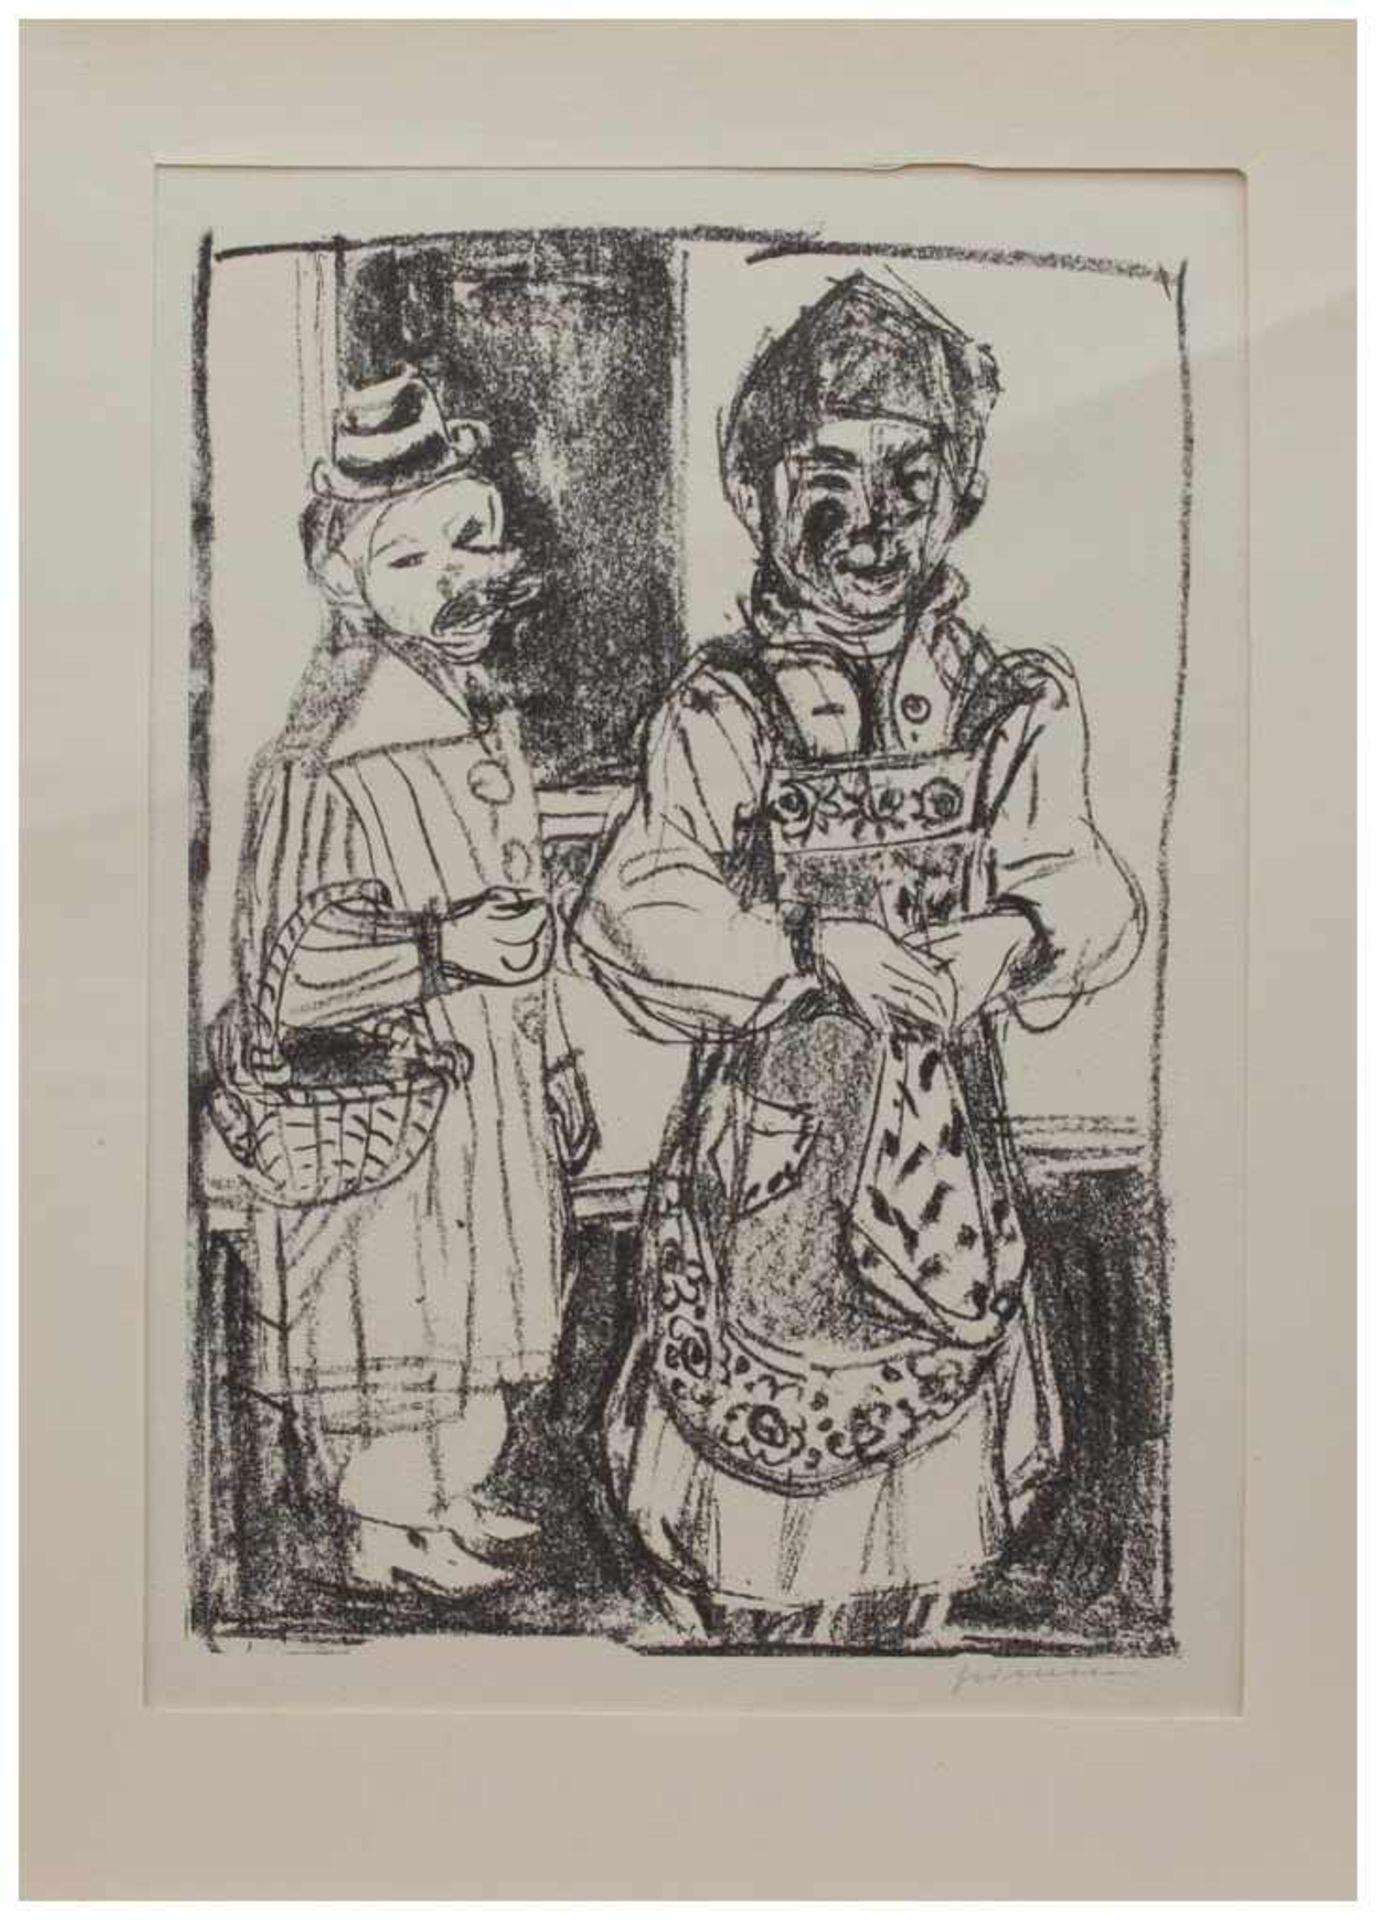 Los 28 - Wilhelm Grimm (Eberstadt 1904 - 1986 Hamburg, deutscher Maler u. Grafiker, Std. a.d. Werkkunstschule